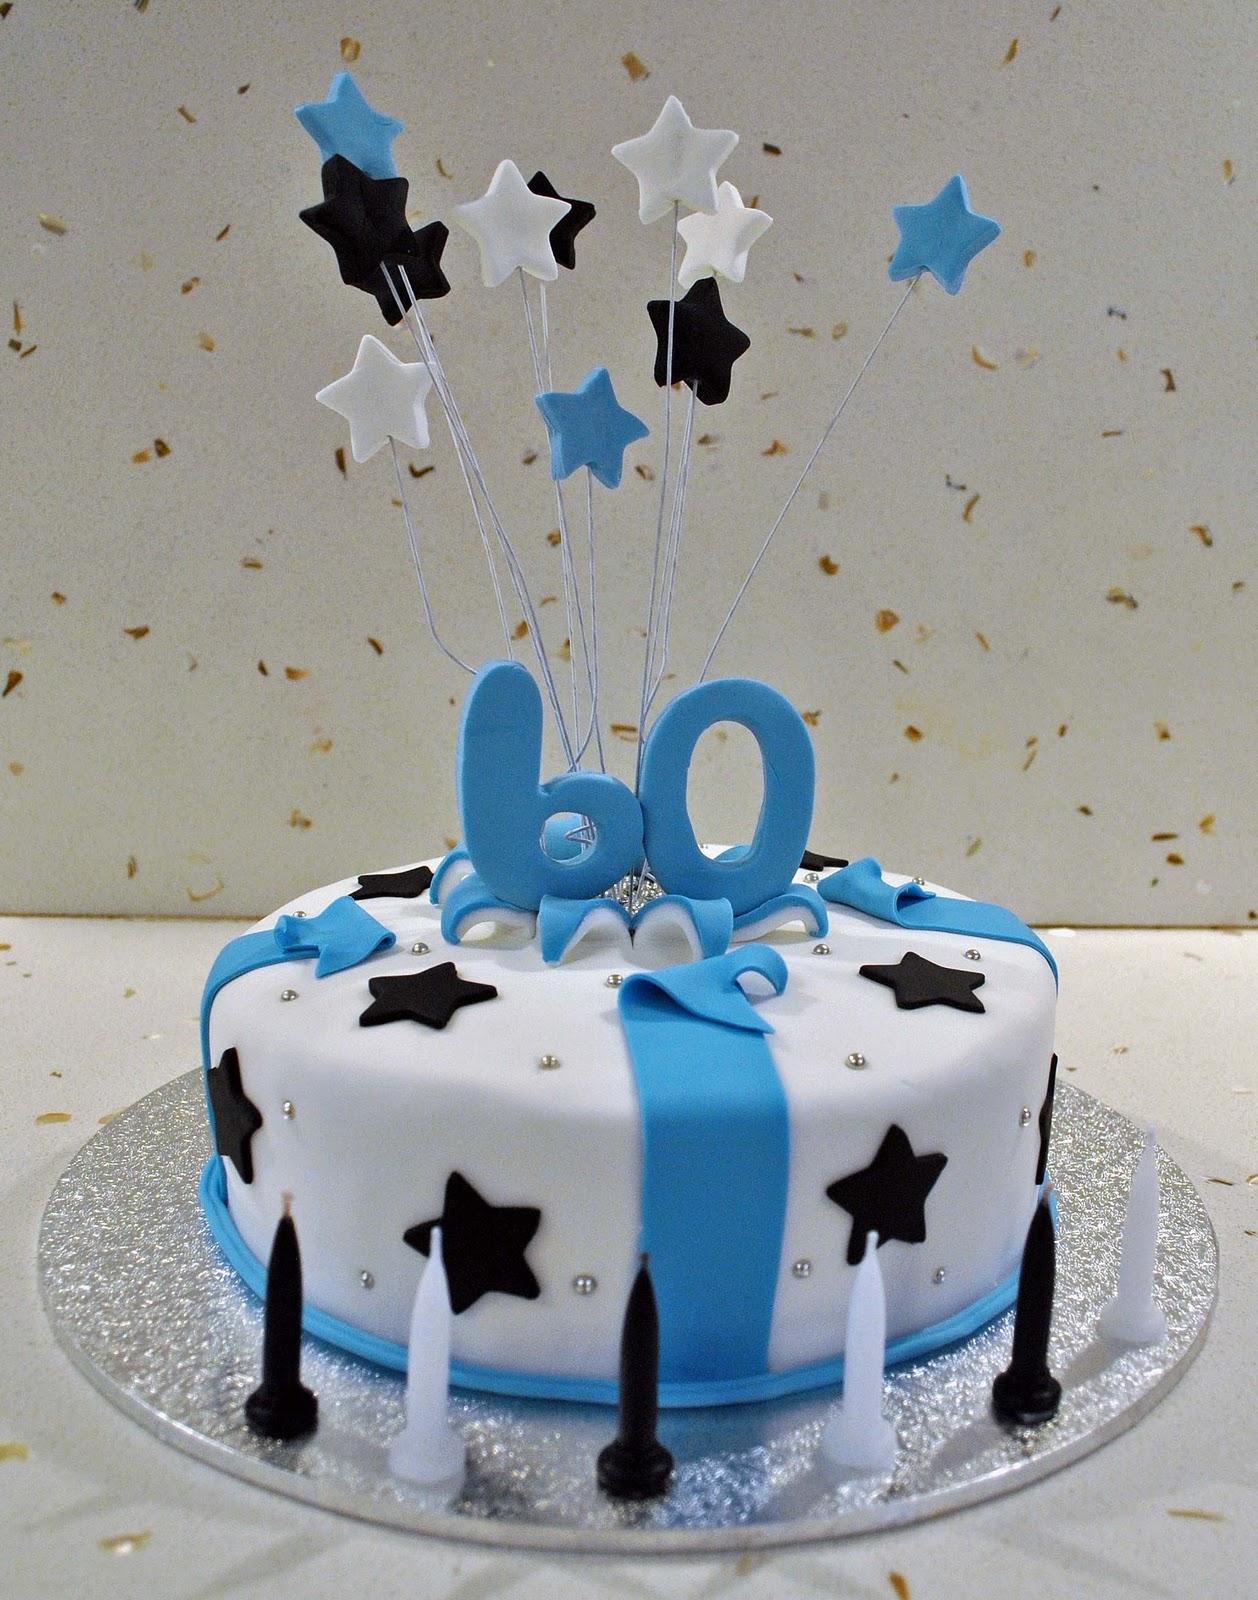 gregs cake.jpg